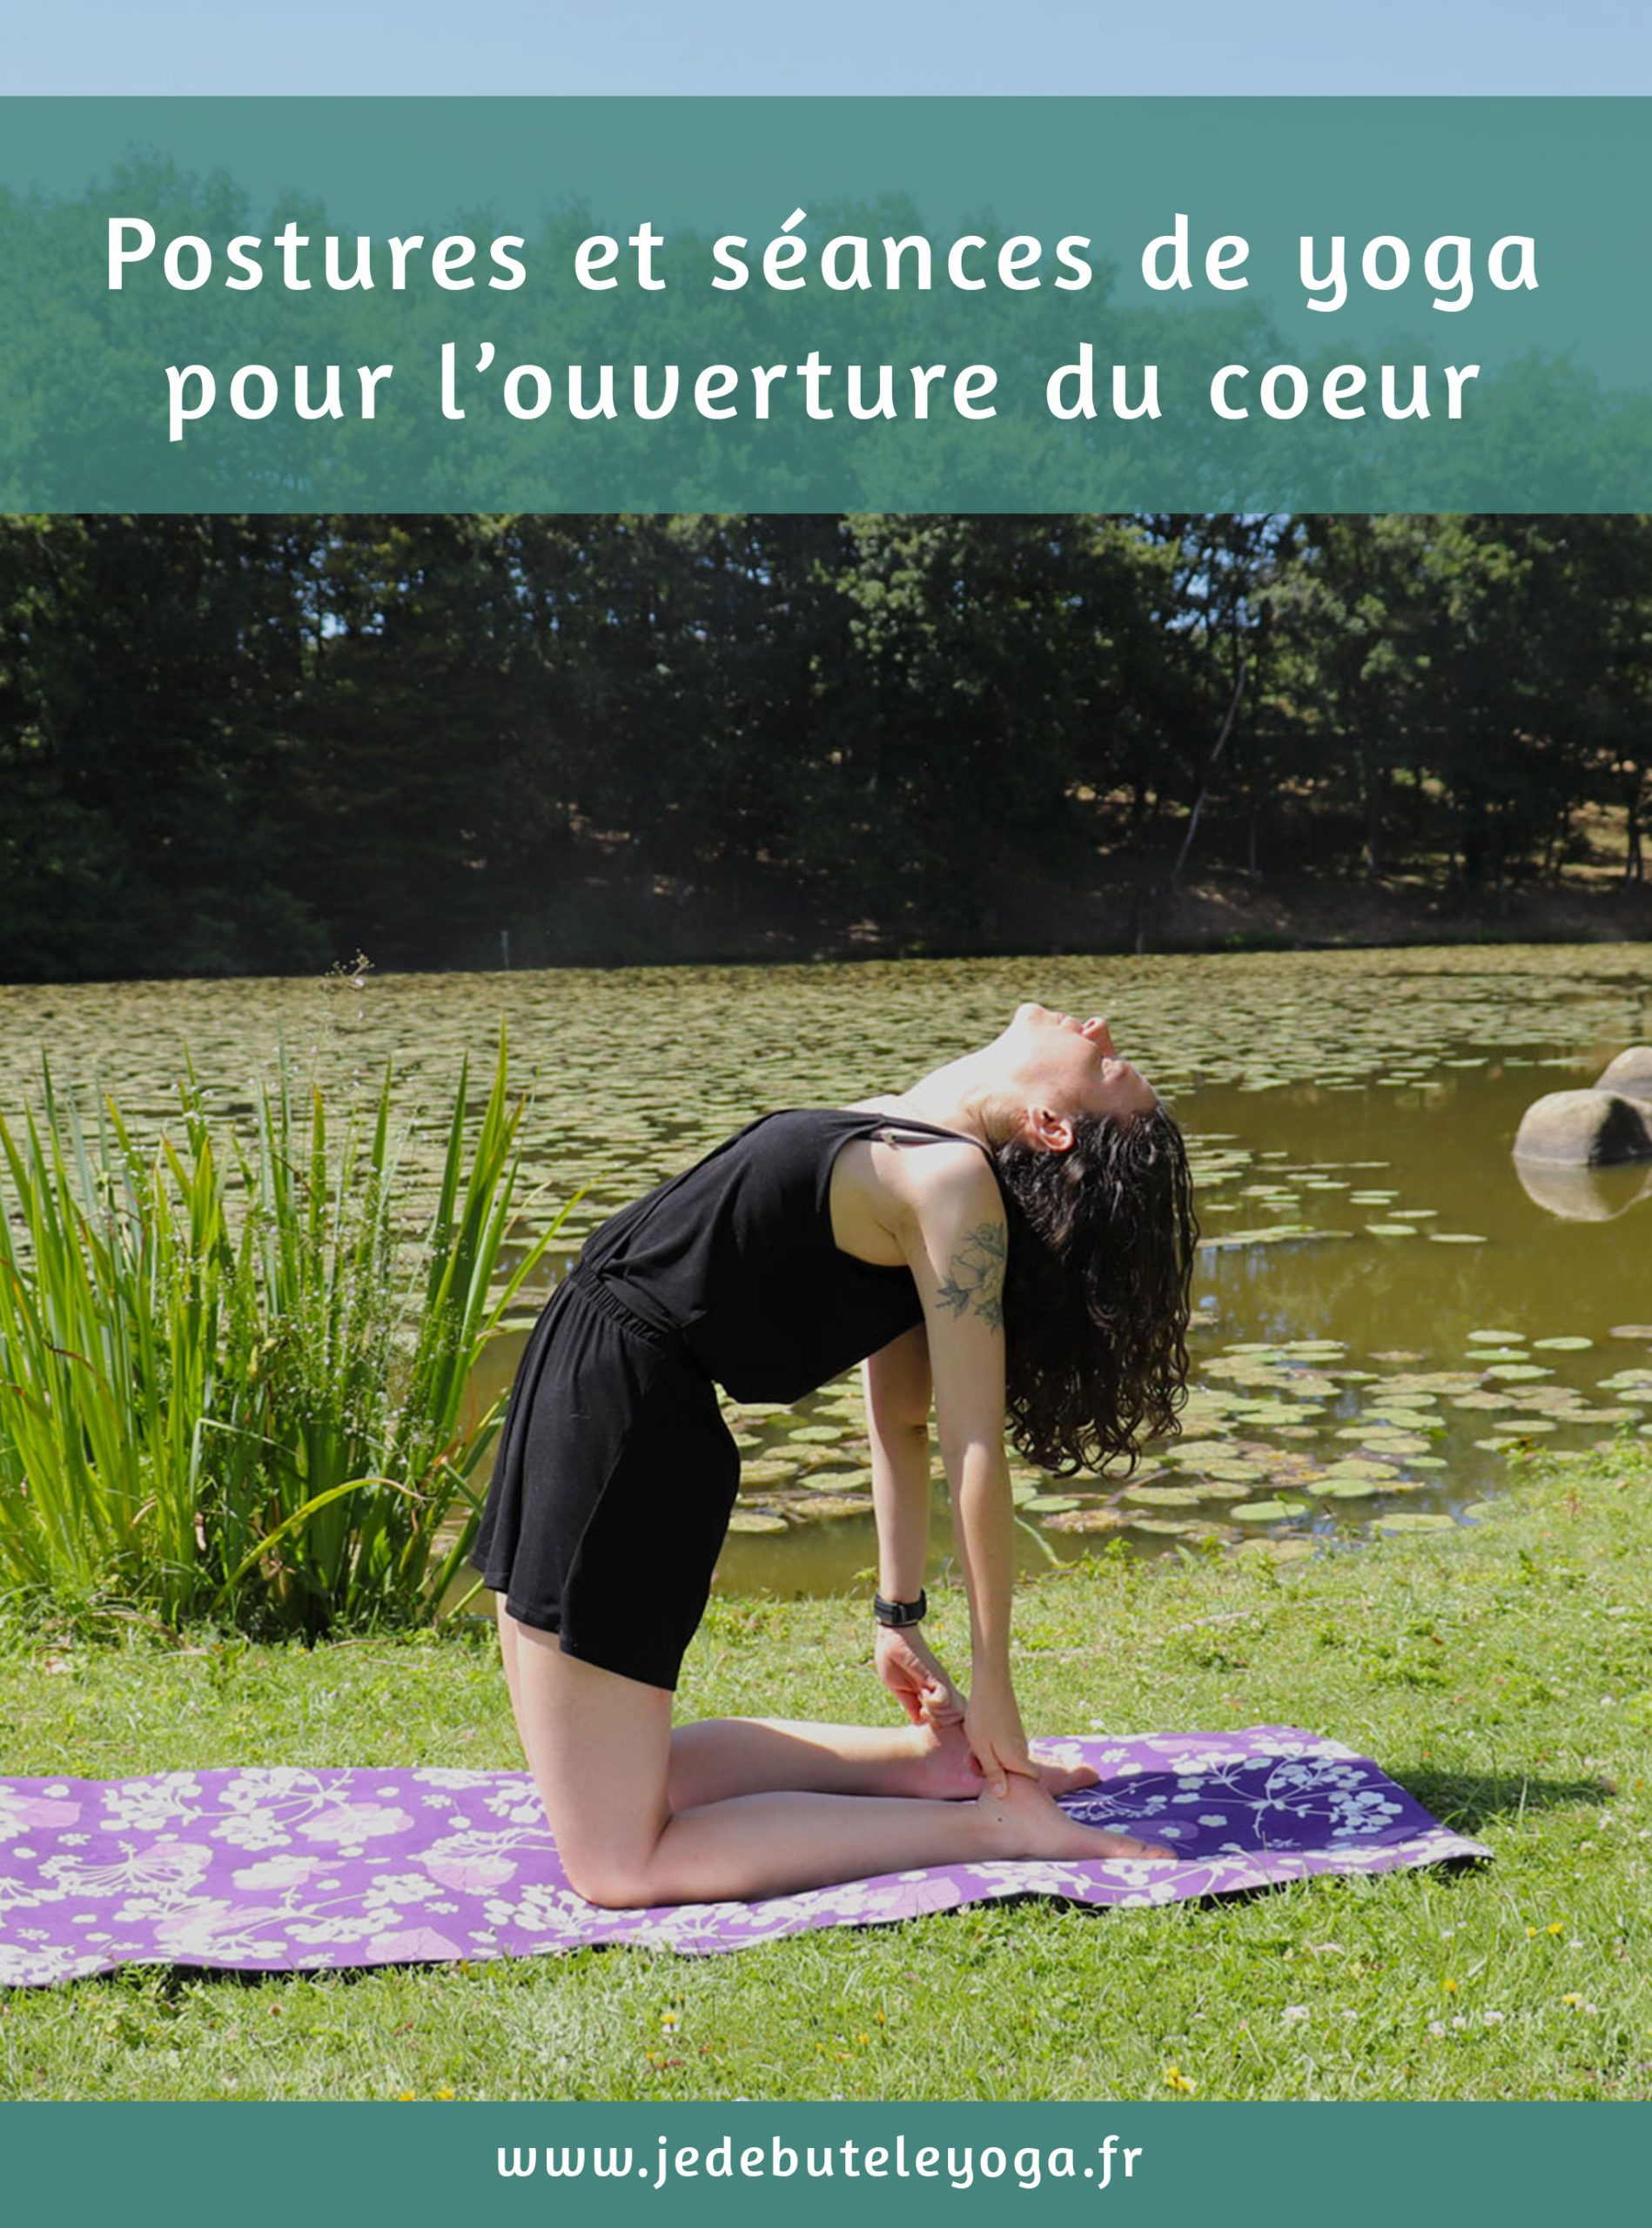 postures ouverture coeur yoga